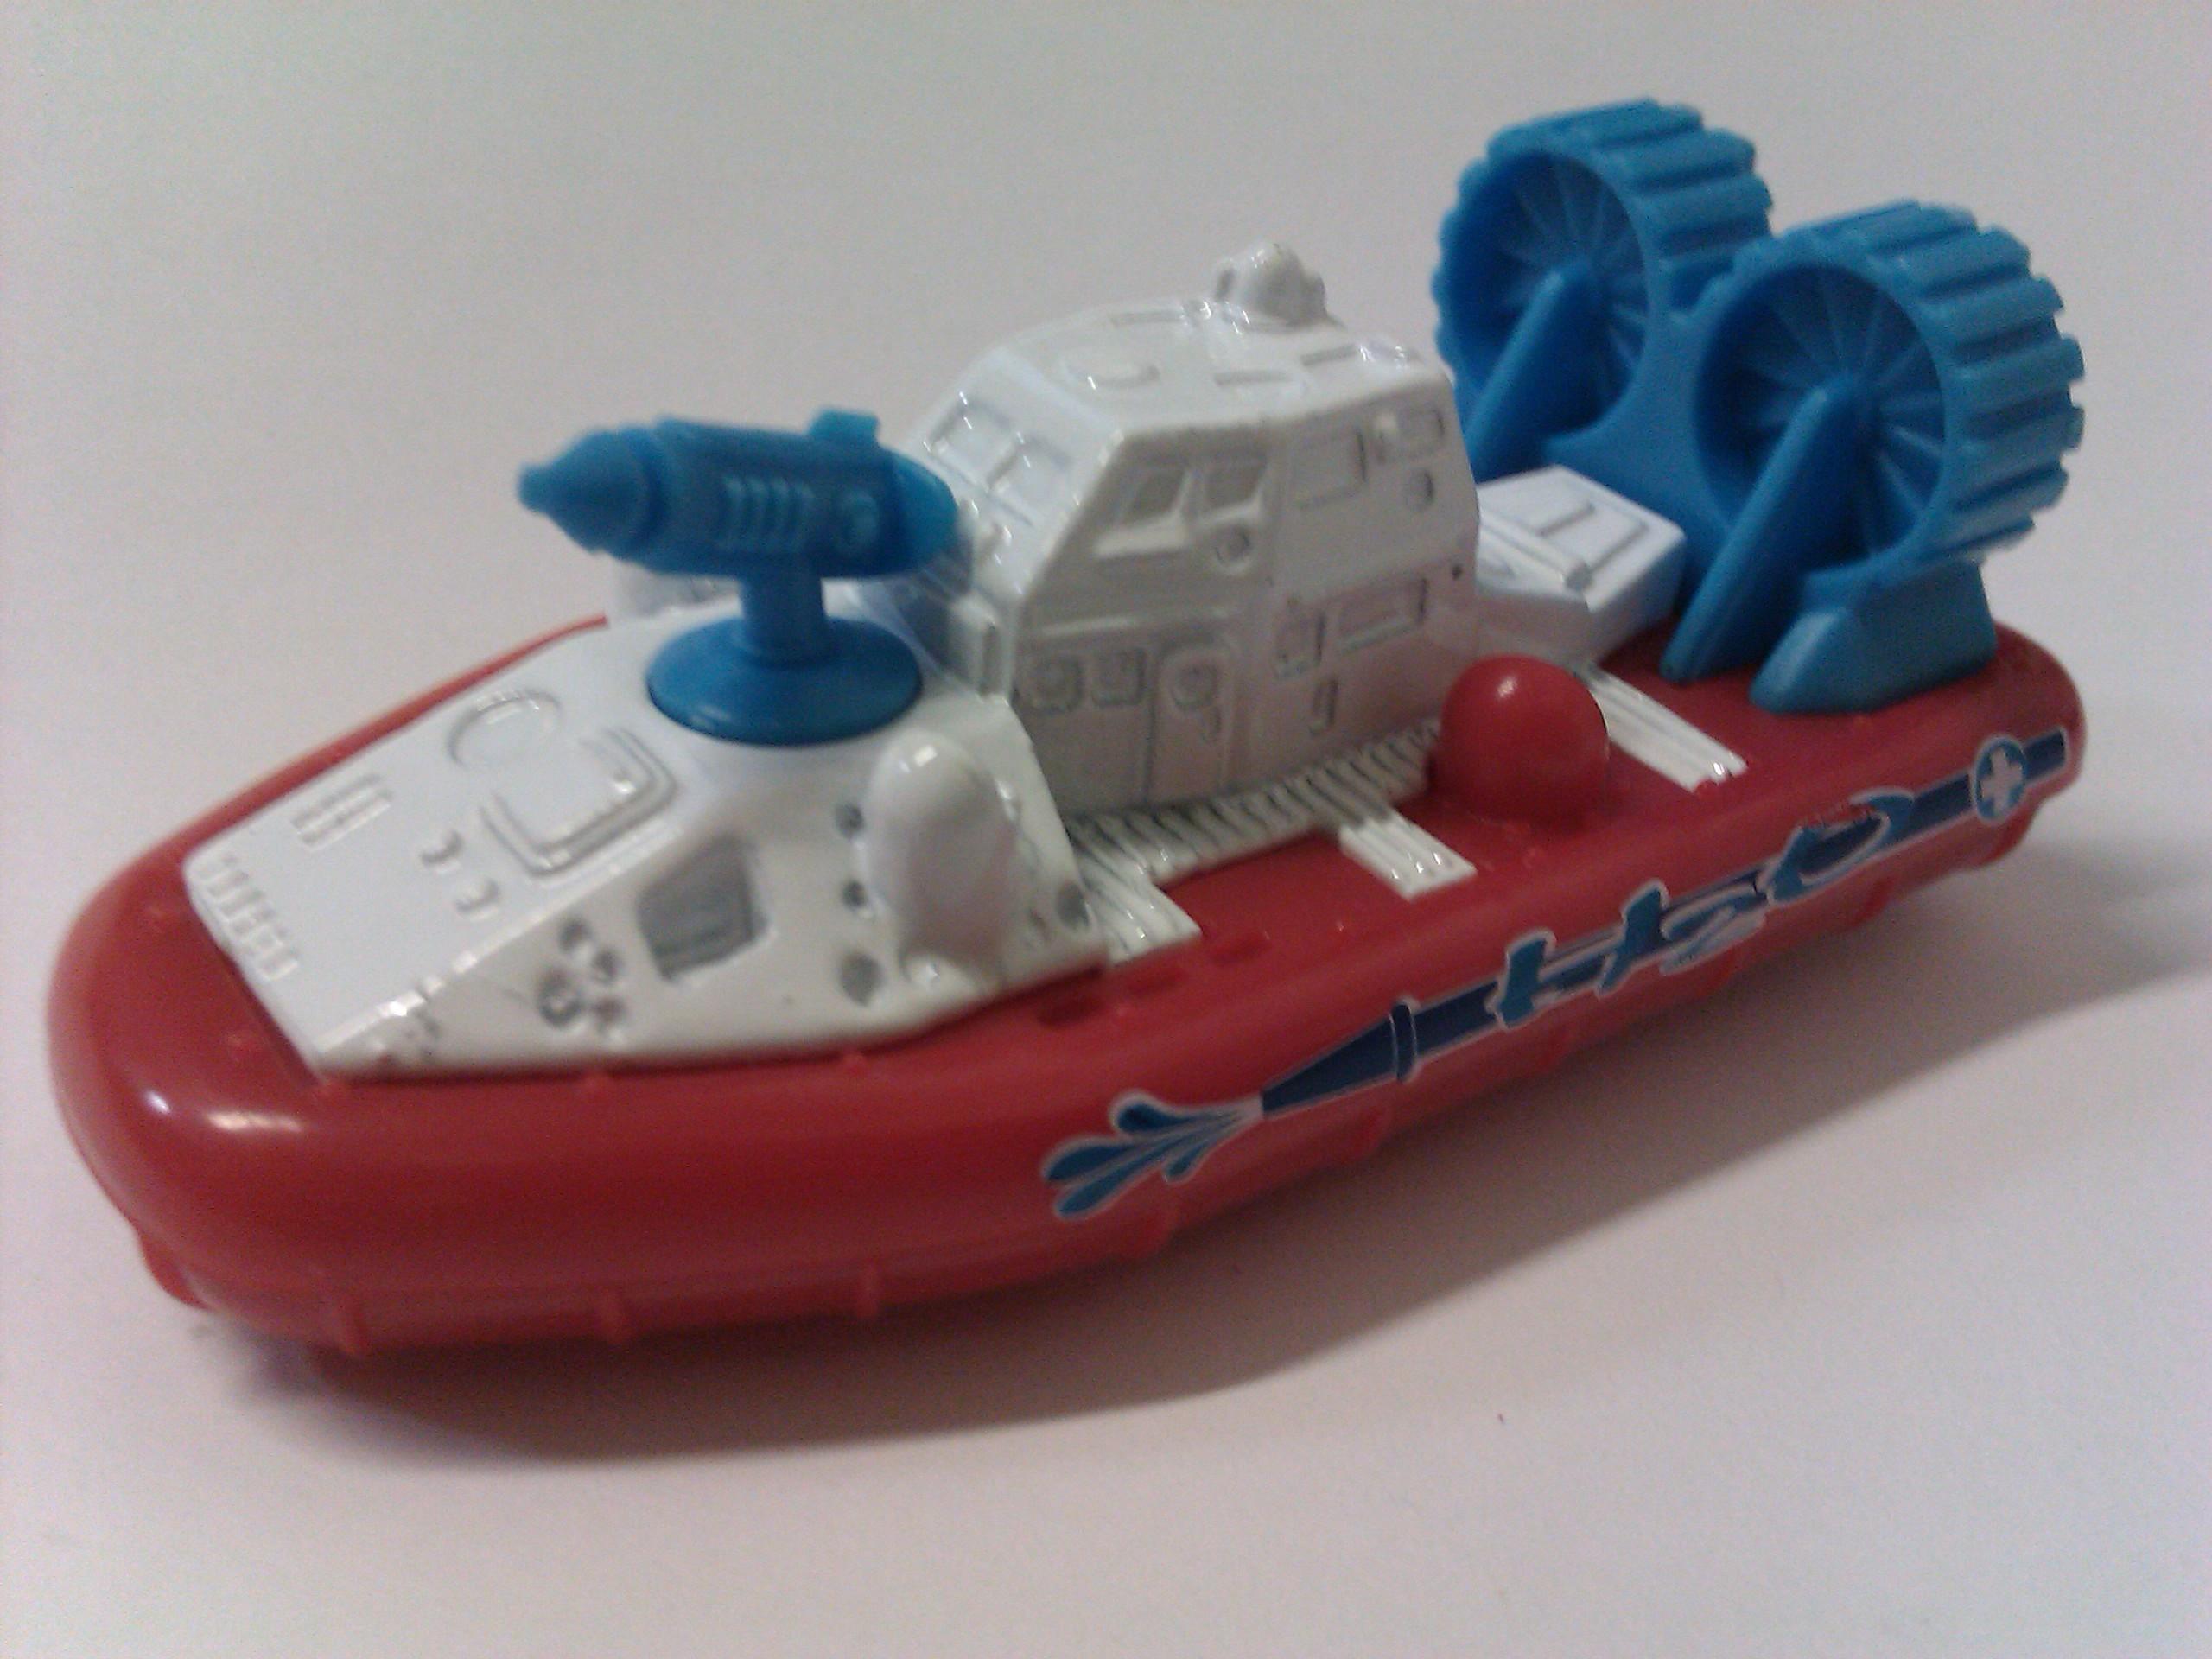 Hovercraft (2000)